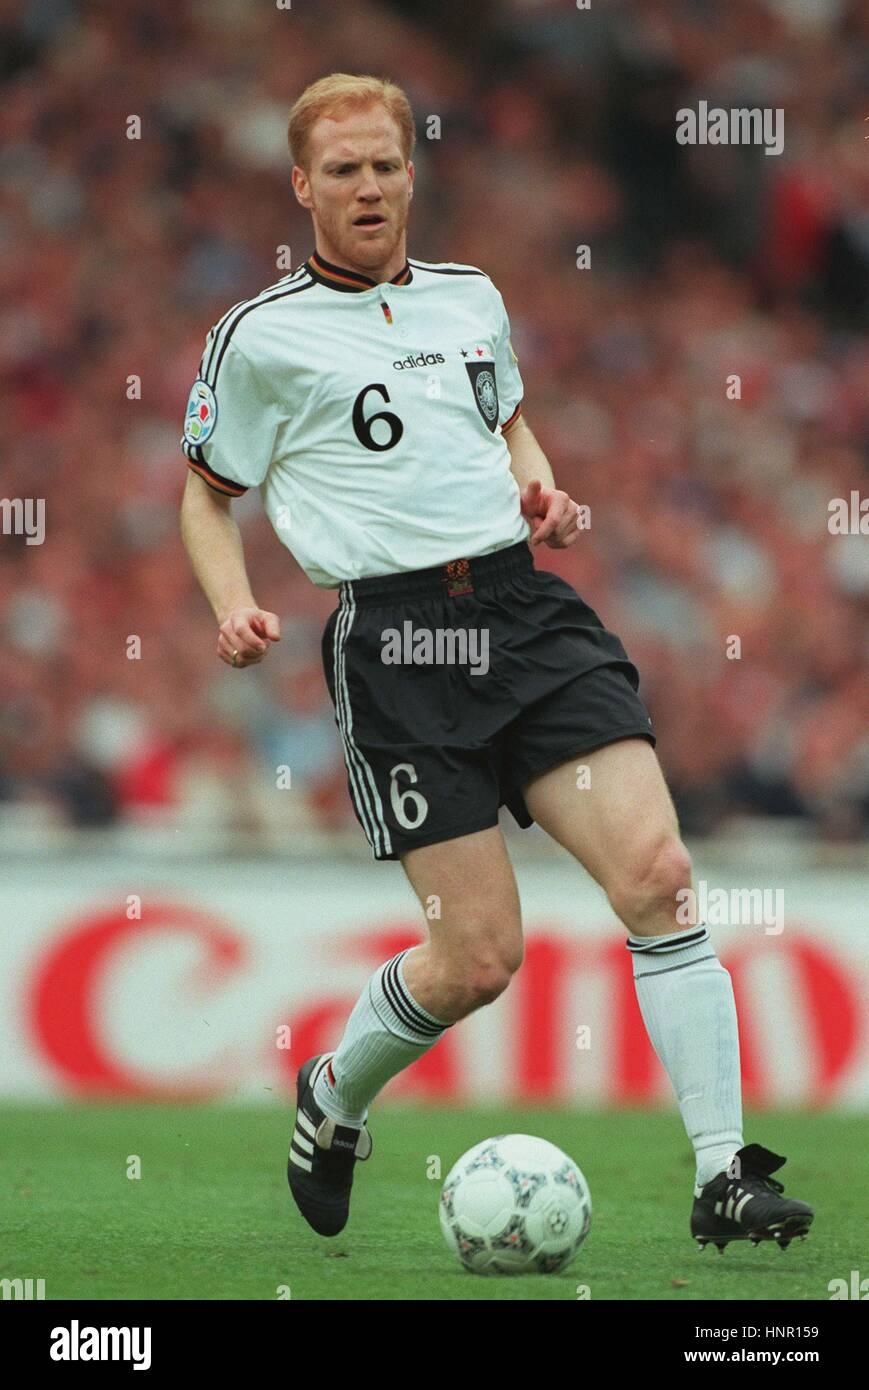 MATTHIAS SAMMER GERMANY & BORUSSIA DORTMUND FC 26 June 1996 Stock Photo: 133886181 - Alamy